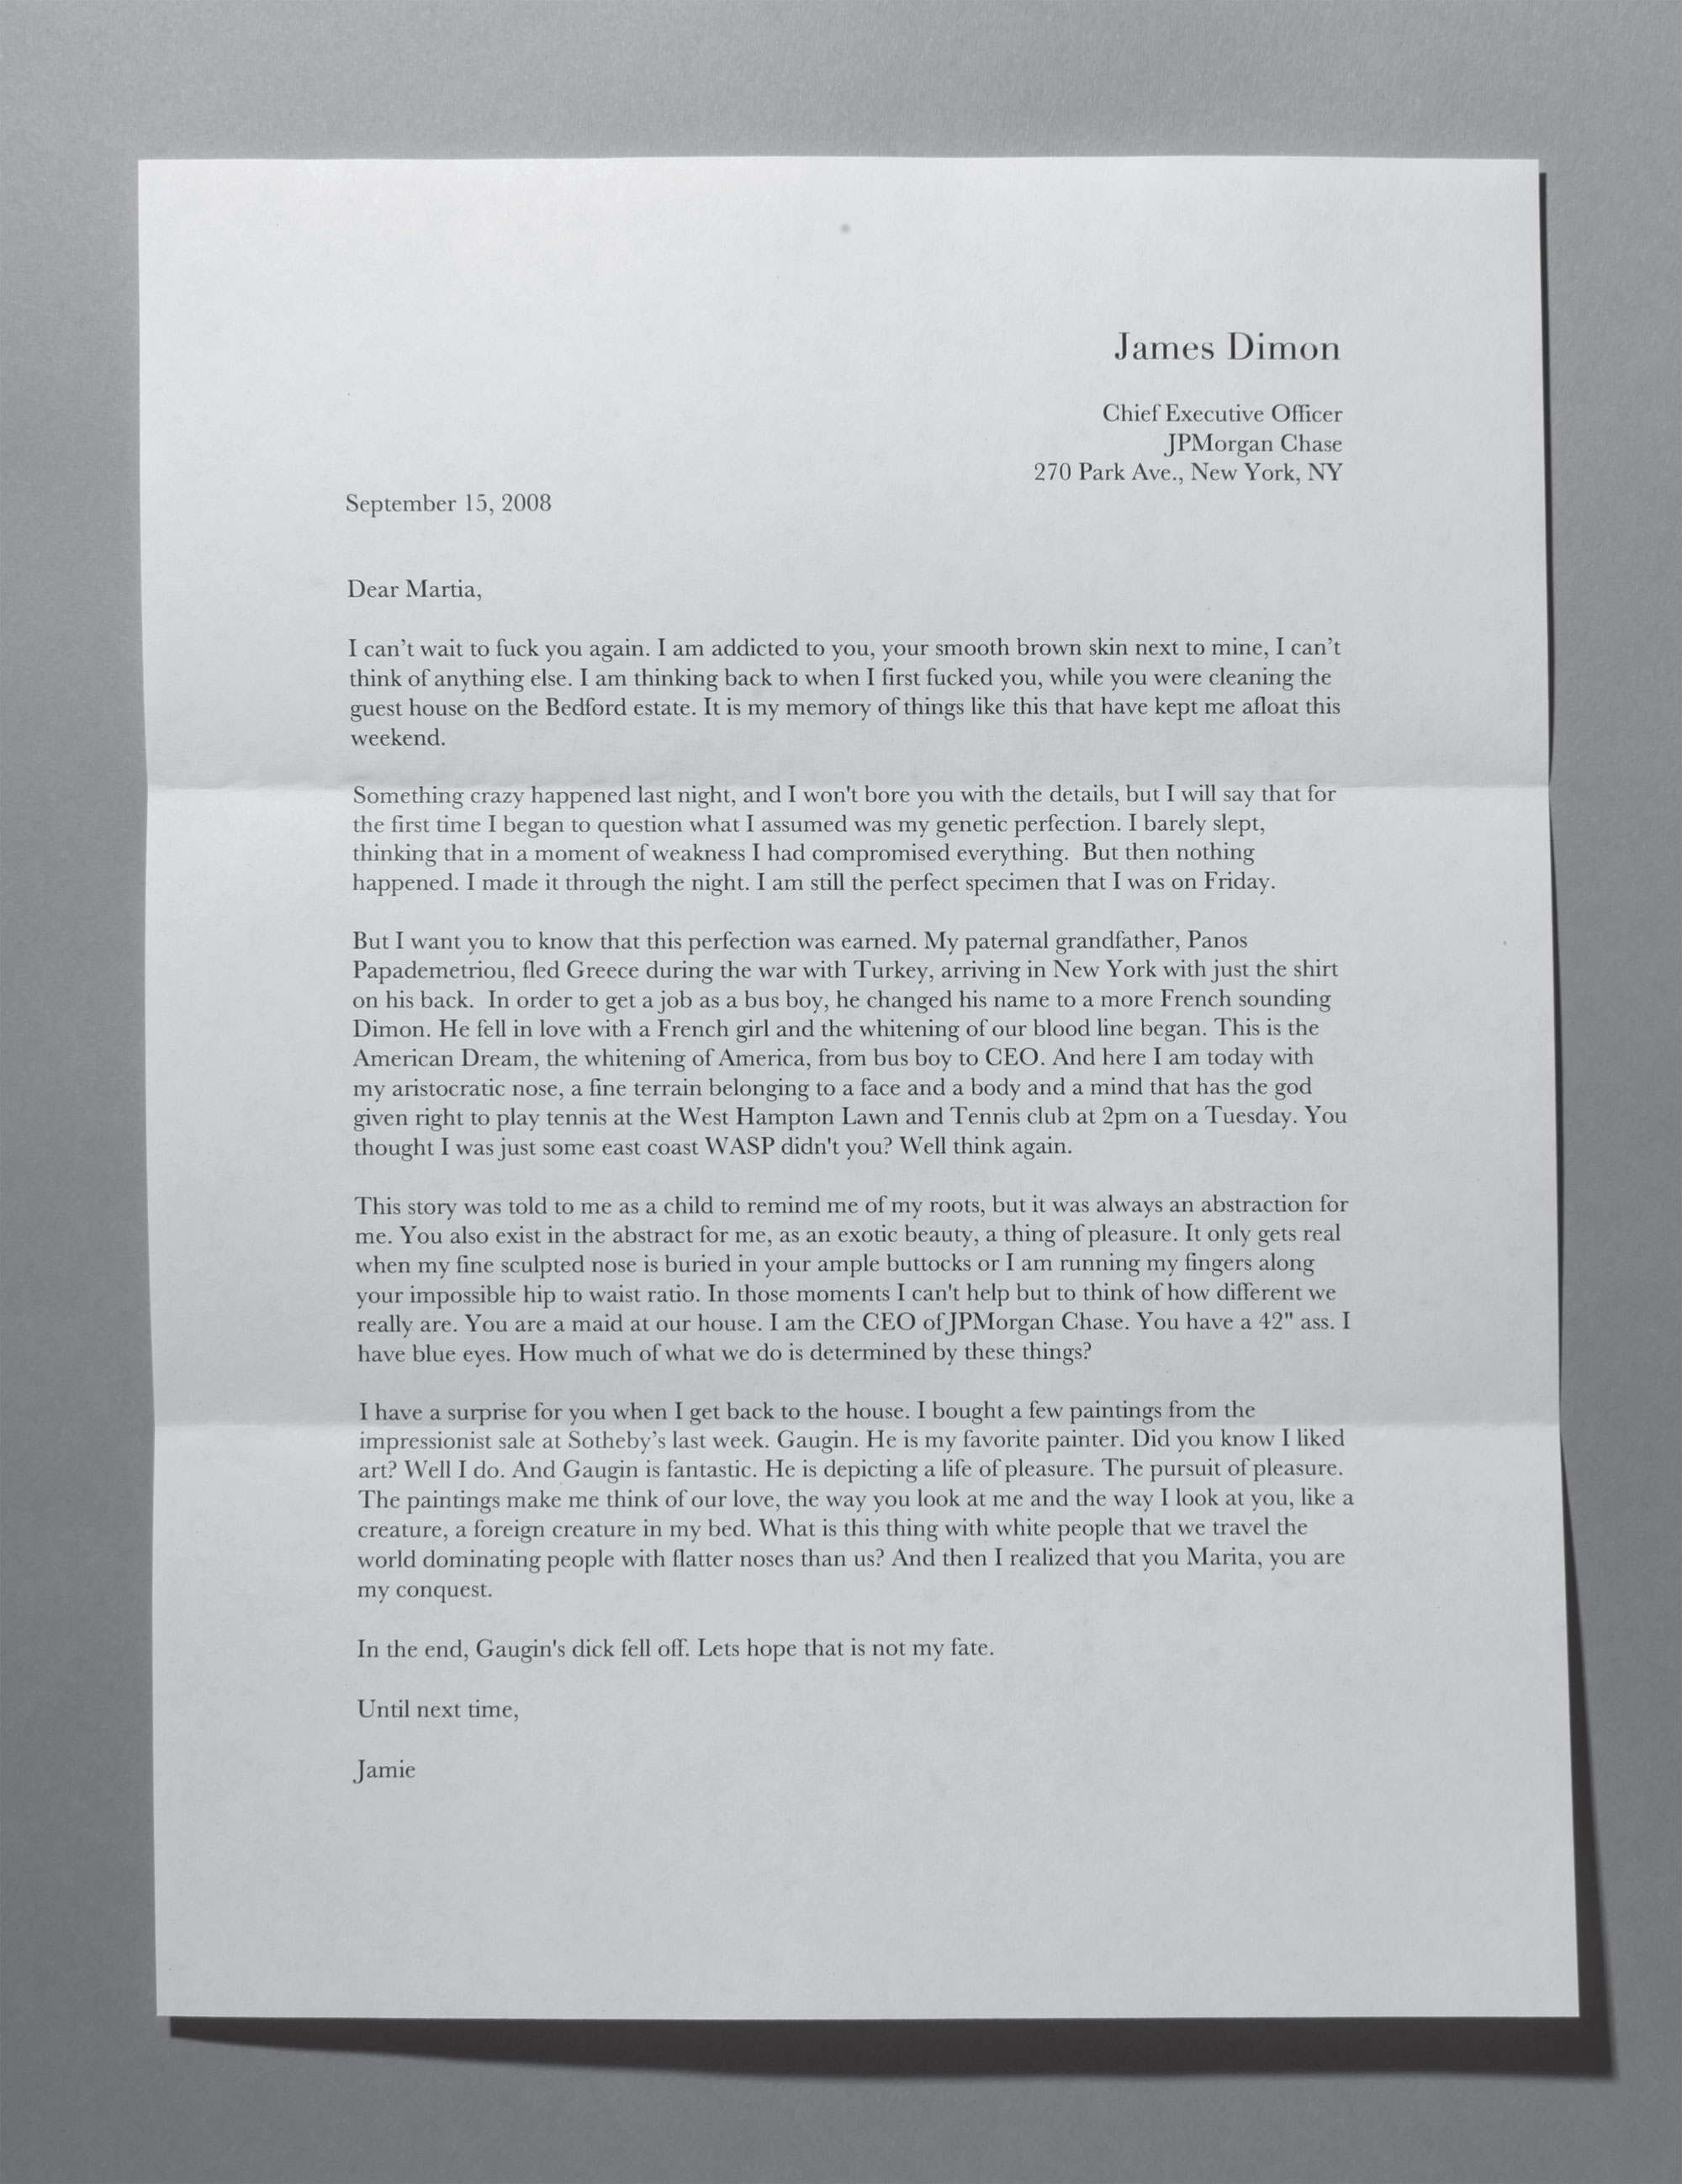 Letter to Martia